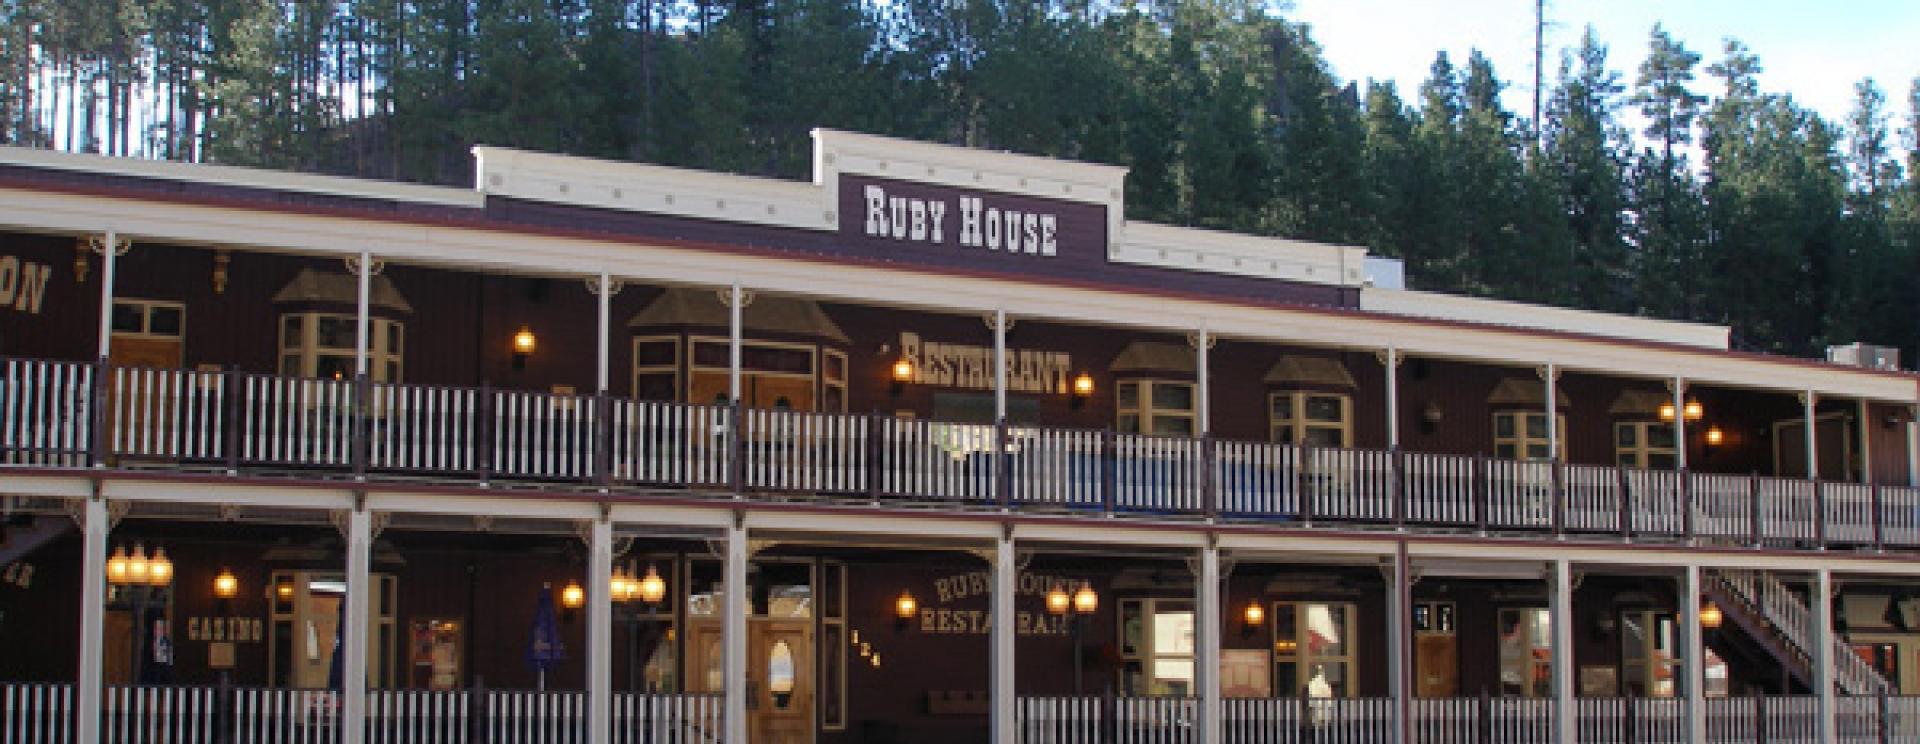 Ruby House Restaurant